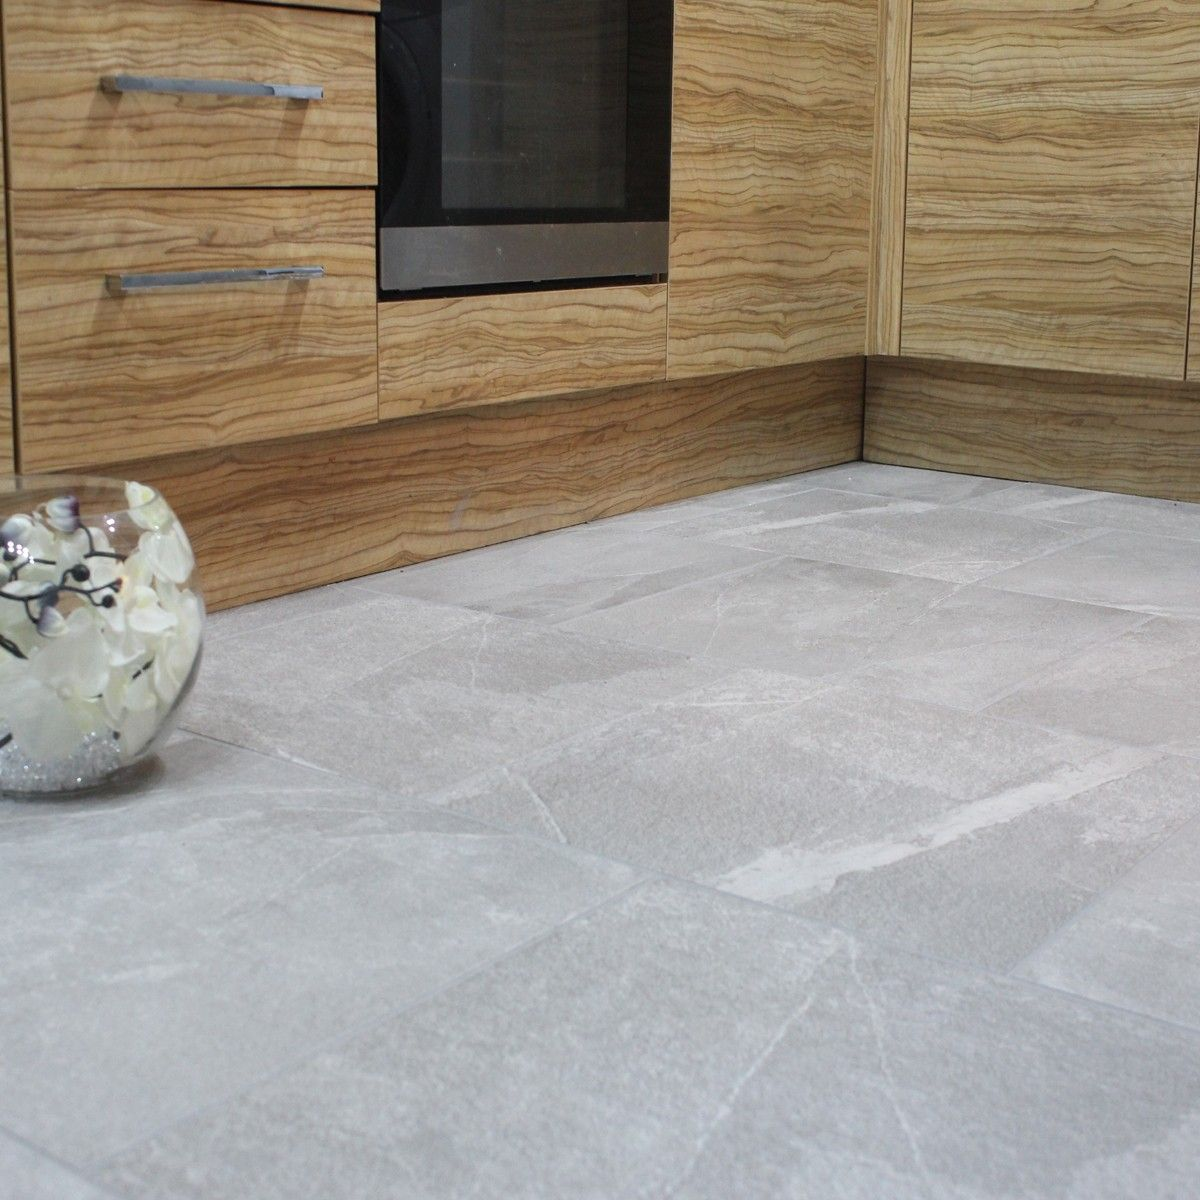 50x50 magma grey floor tiles pinterest tiles online gray crown tiles online shop stocks large ranges of tiles dailygadgetfo Images